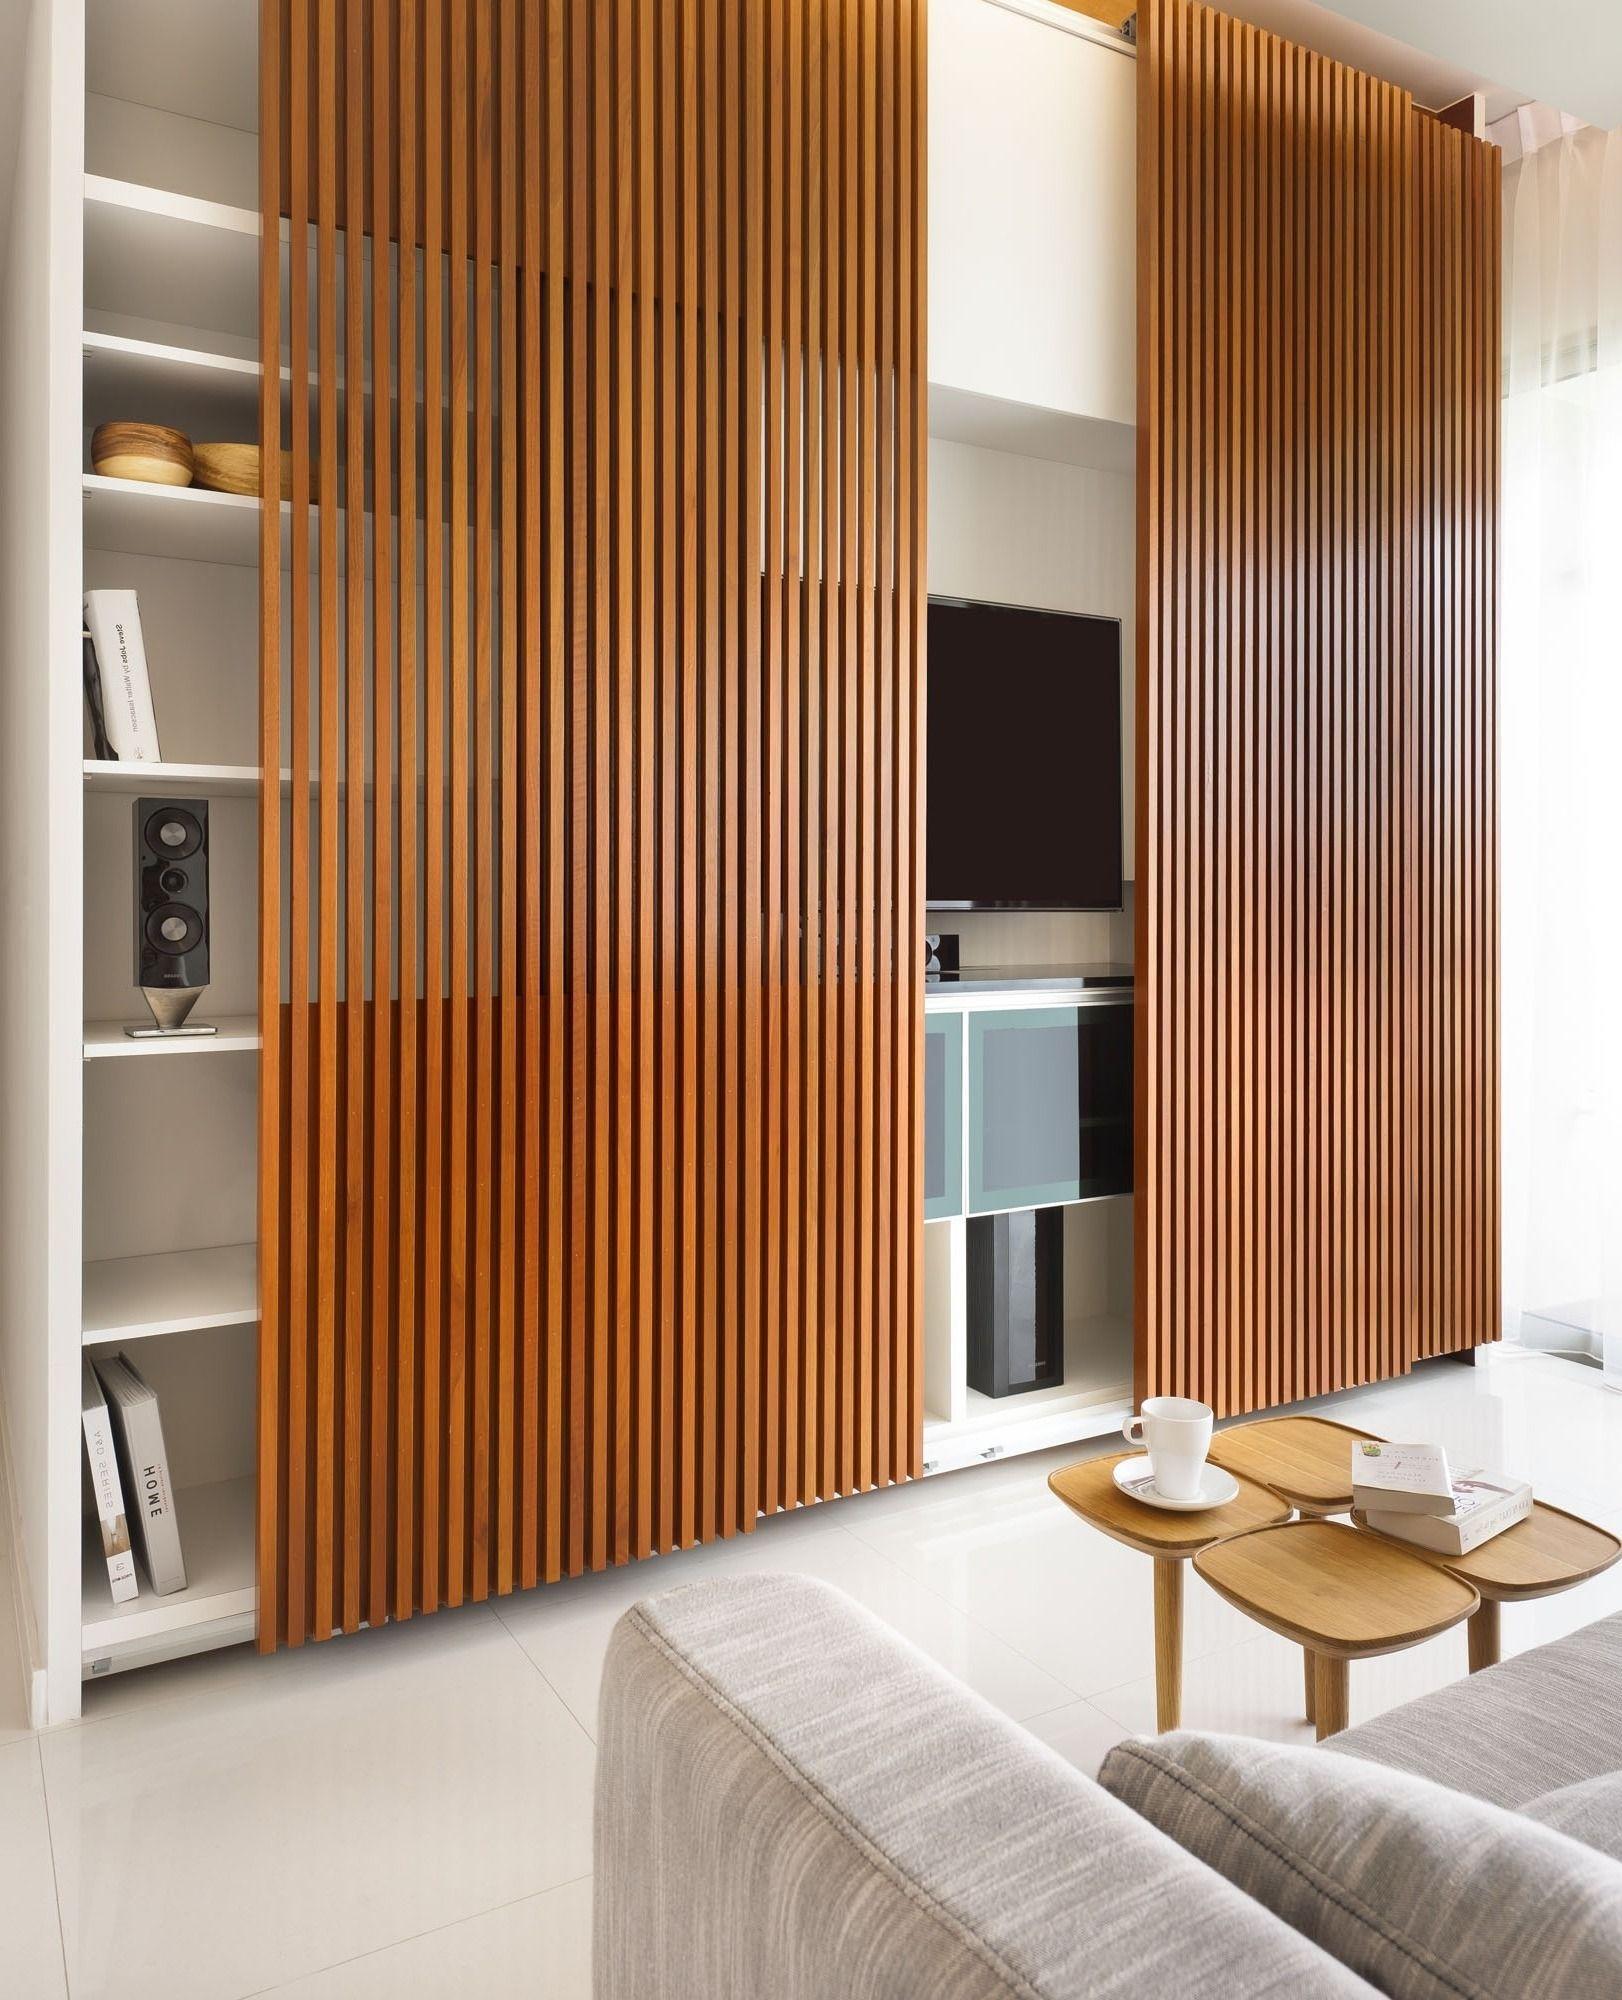 Wandverkleidung holz wohnzimmer wandverkleidung altholz gehackt eiche bs holzdesign - Holzvertafelung wand ...